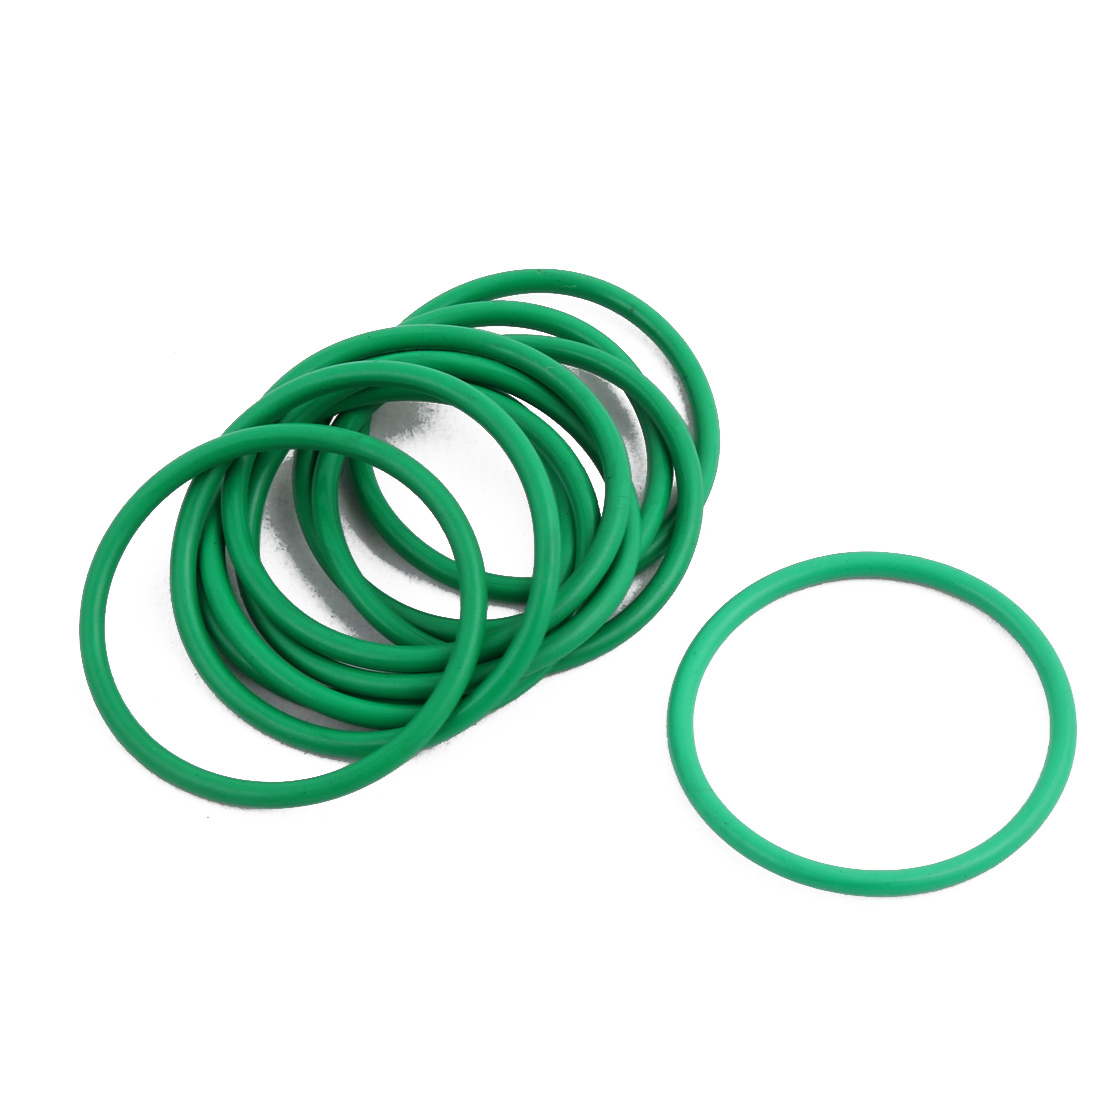 10Pcs Green 29 x 1.9mm Industrial Flexible Rubber O Ring Oil Sealing Grommets